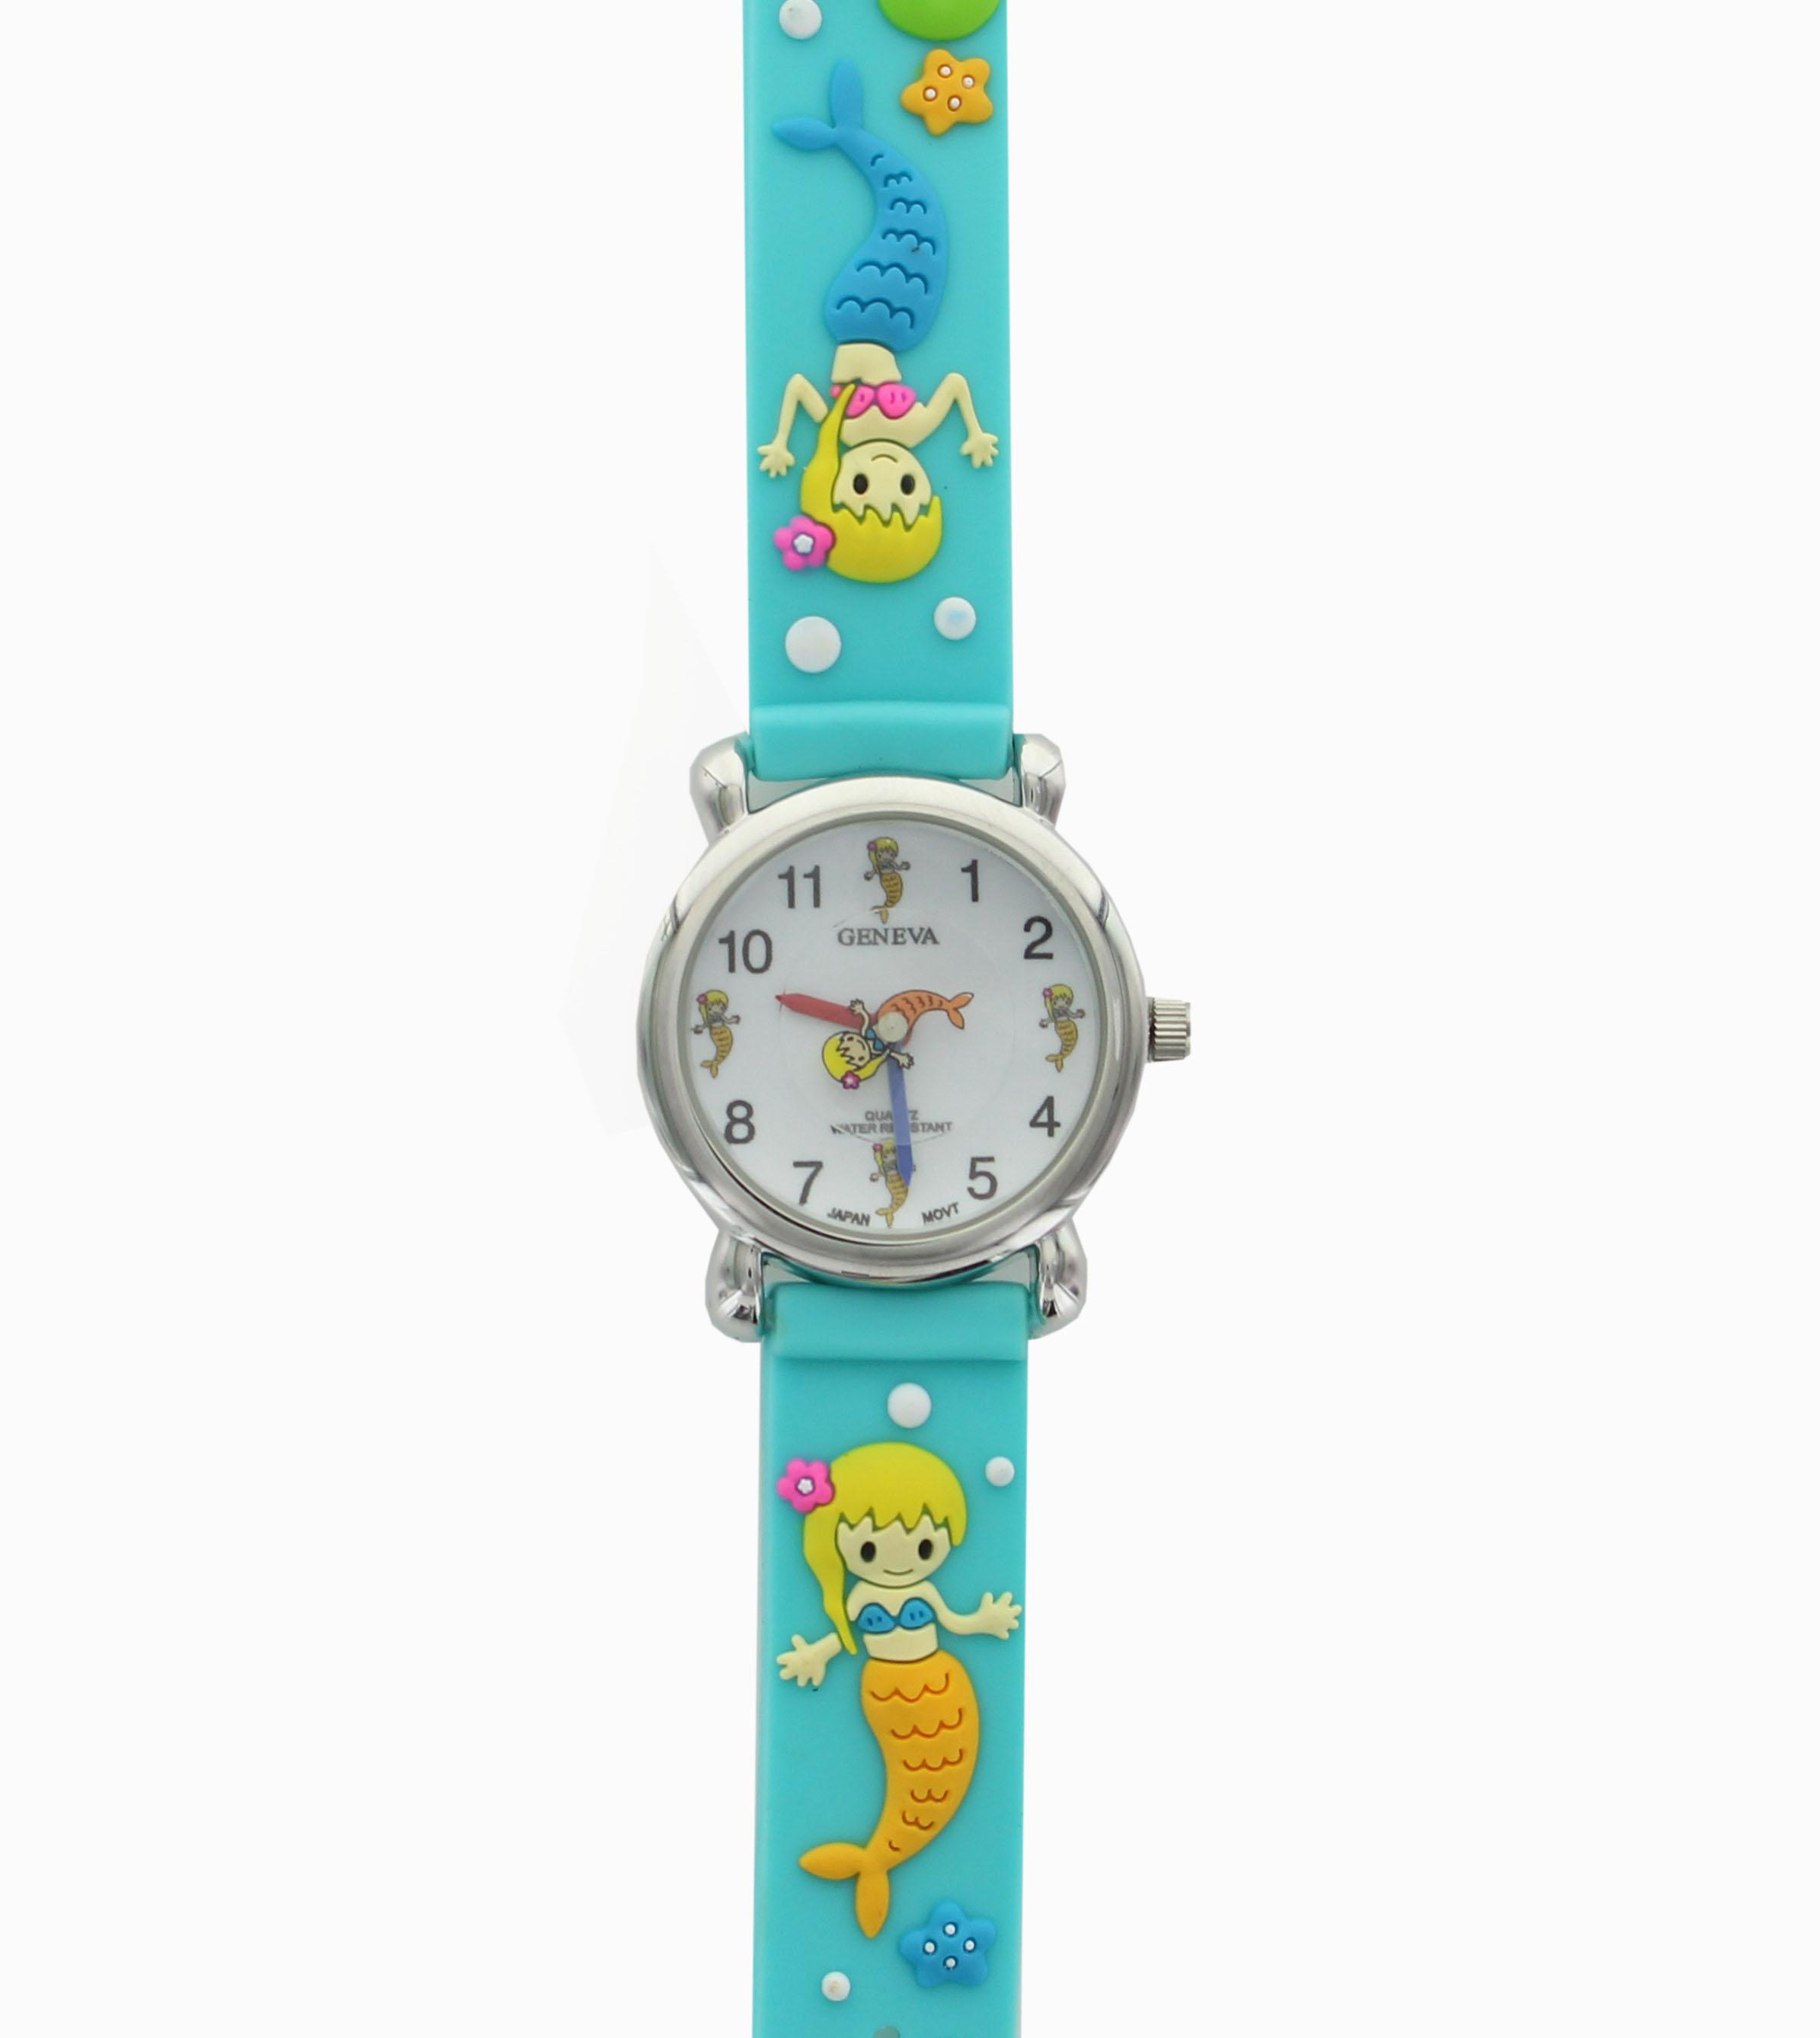 Uae online watch shop